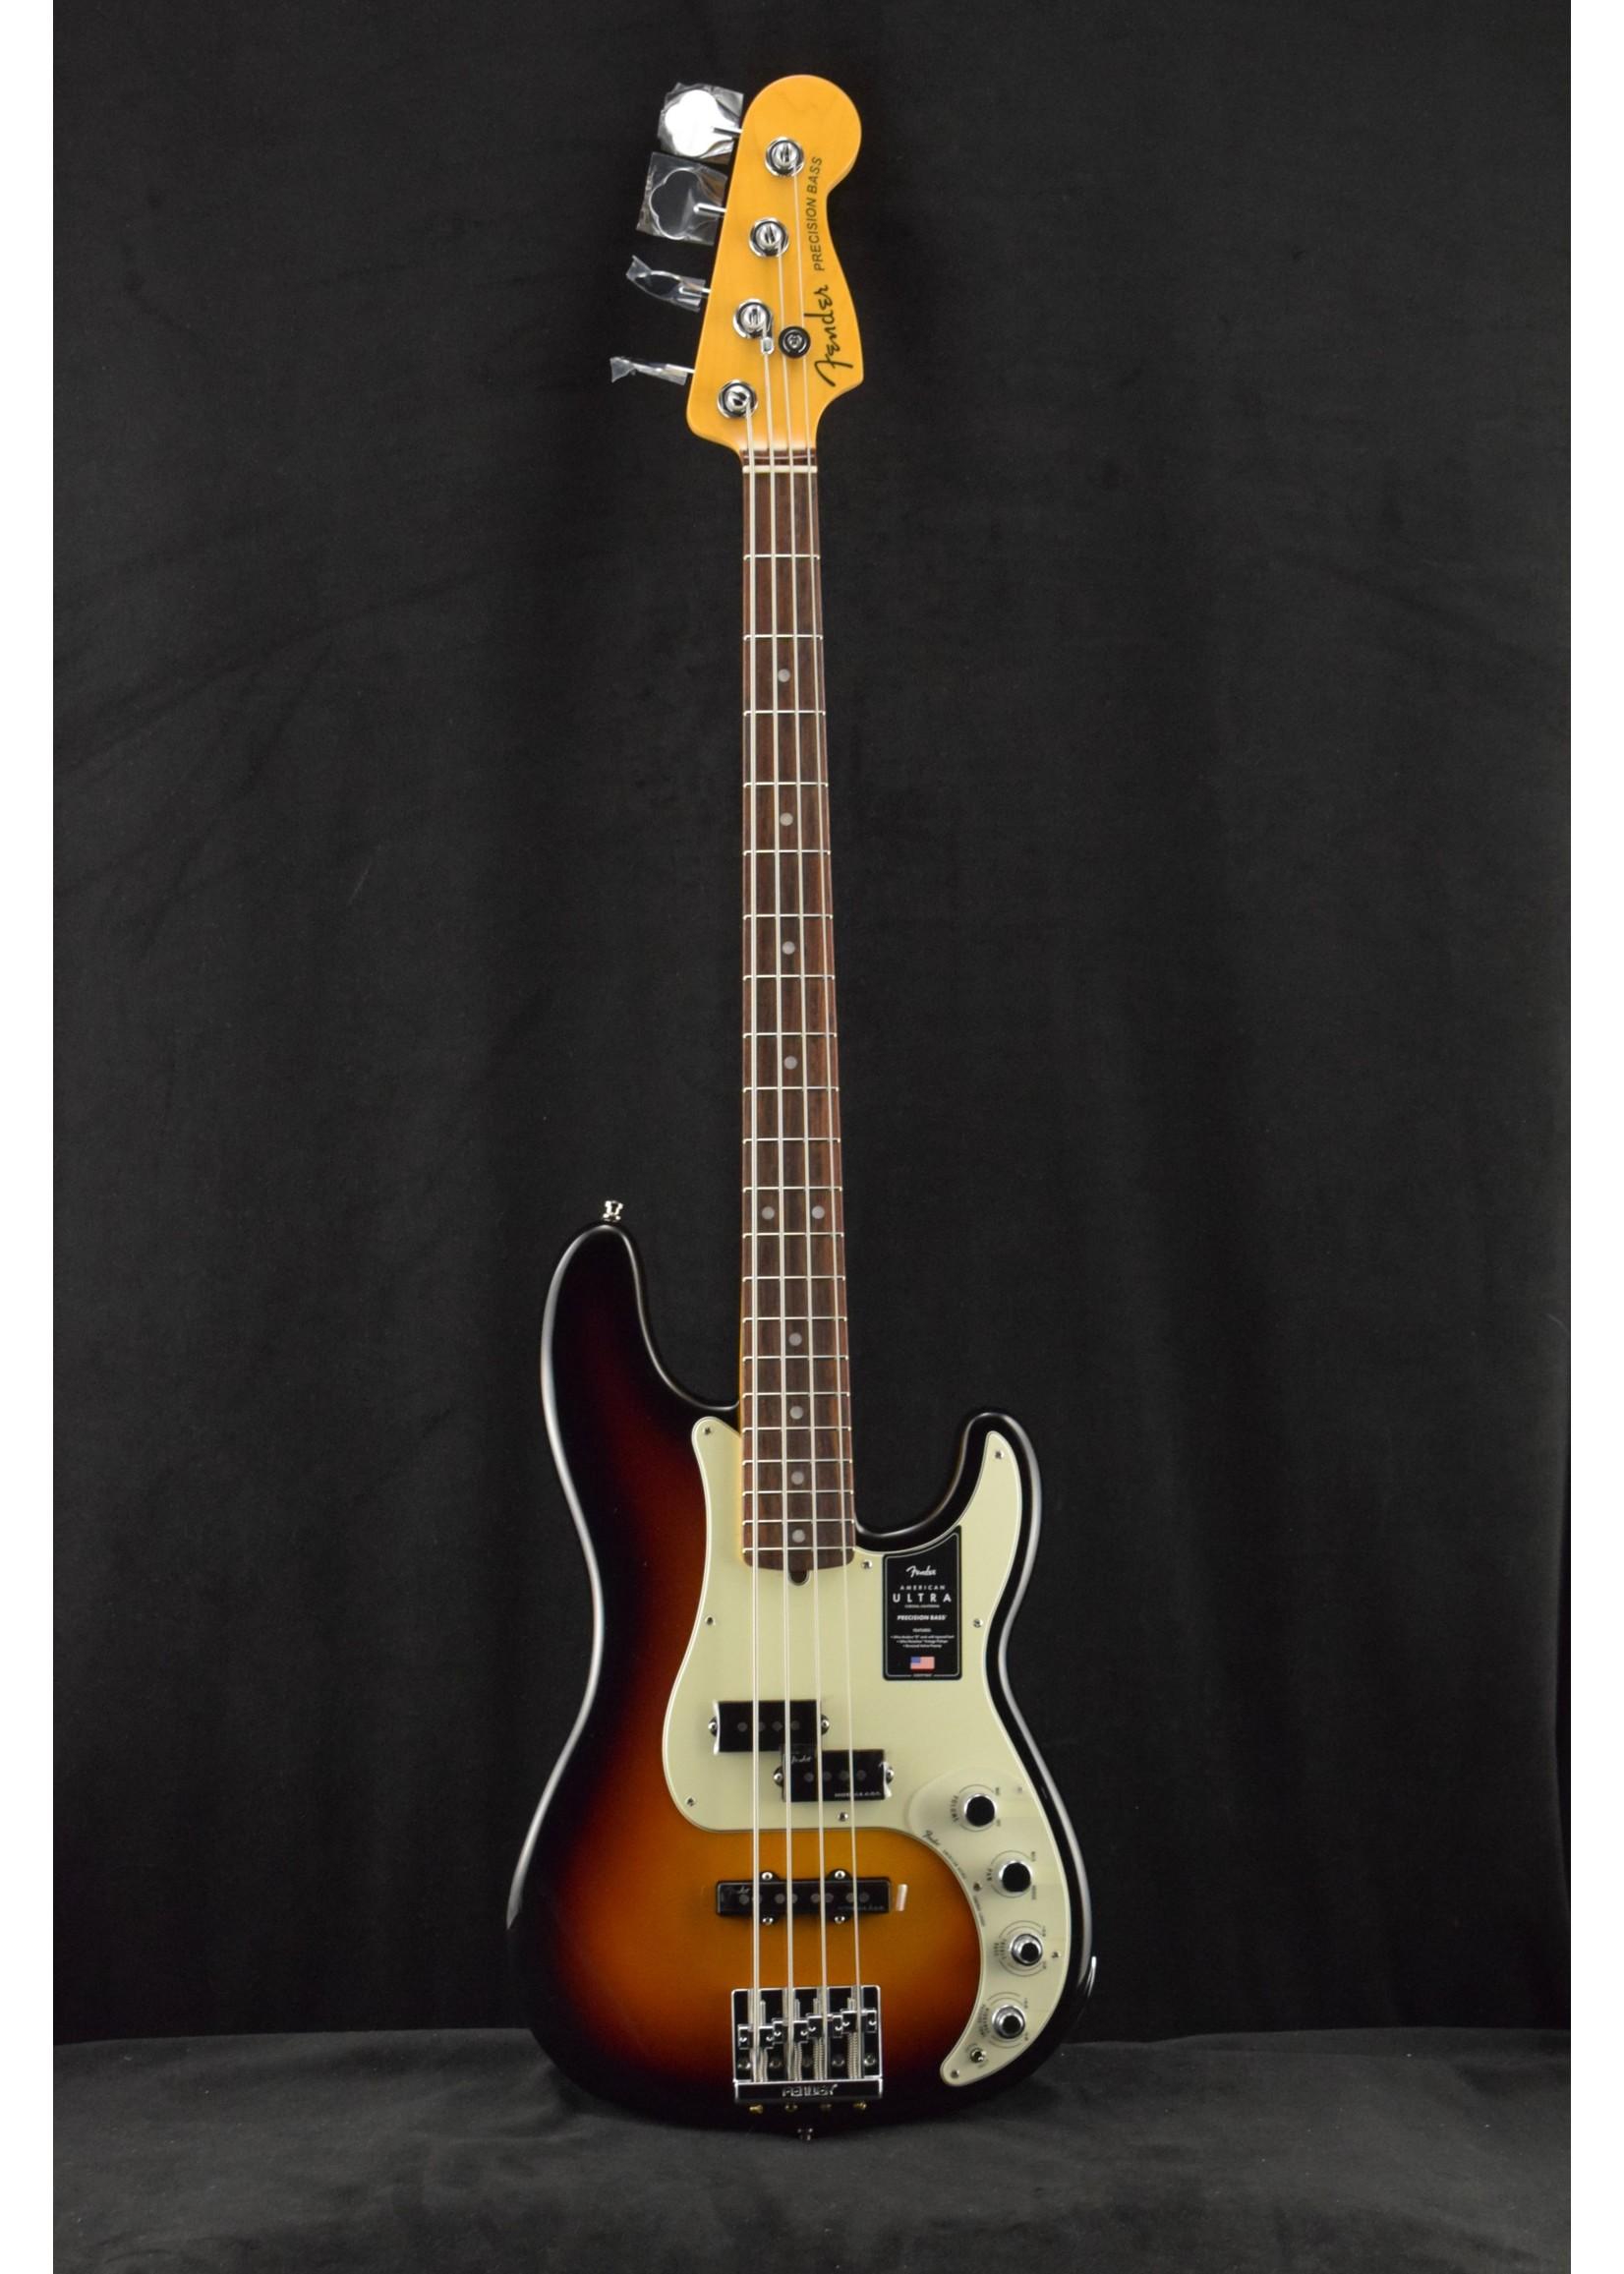 Fender Fender American Ultra Precision Bass RW Ultraburst